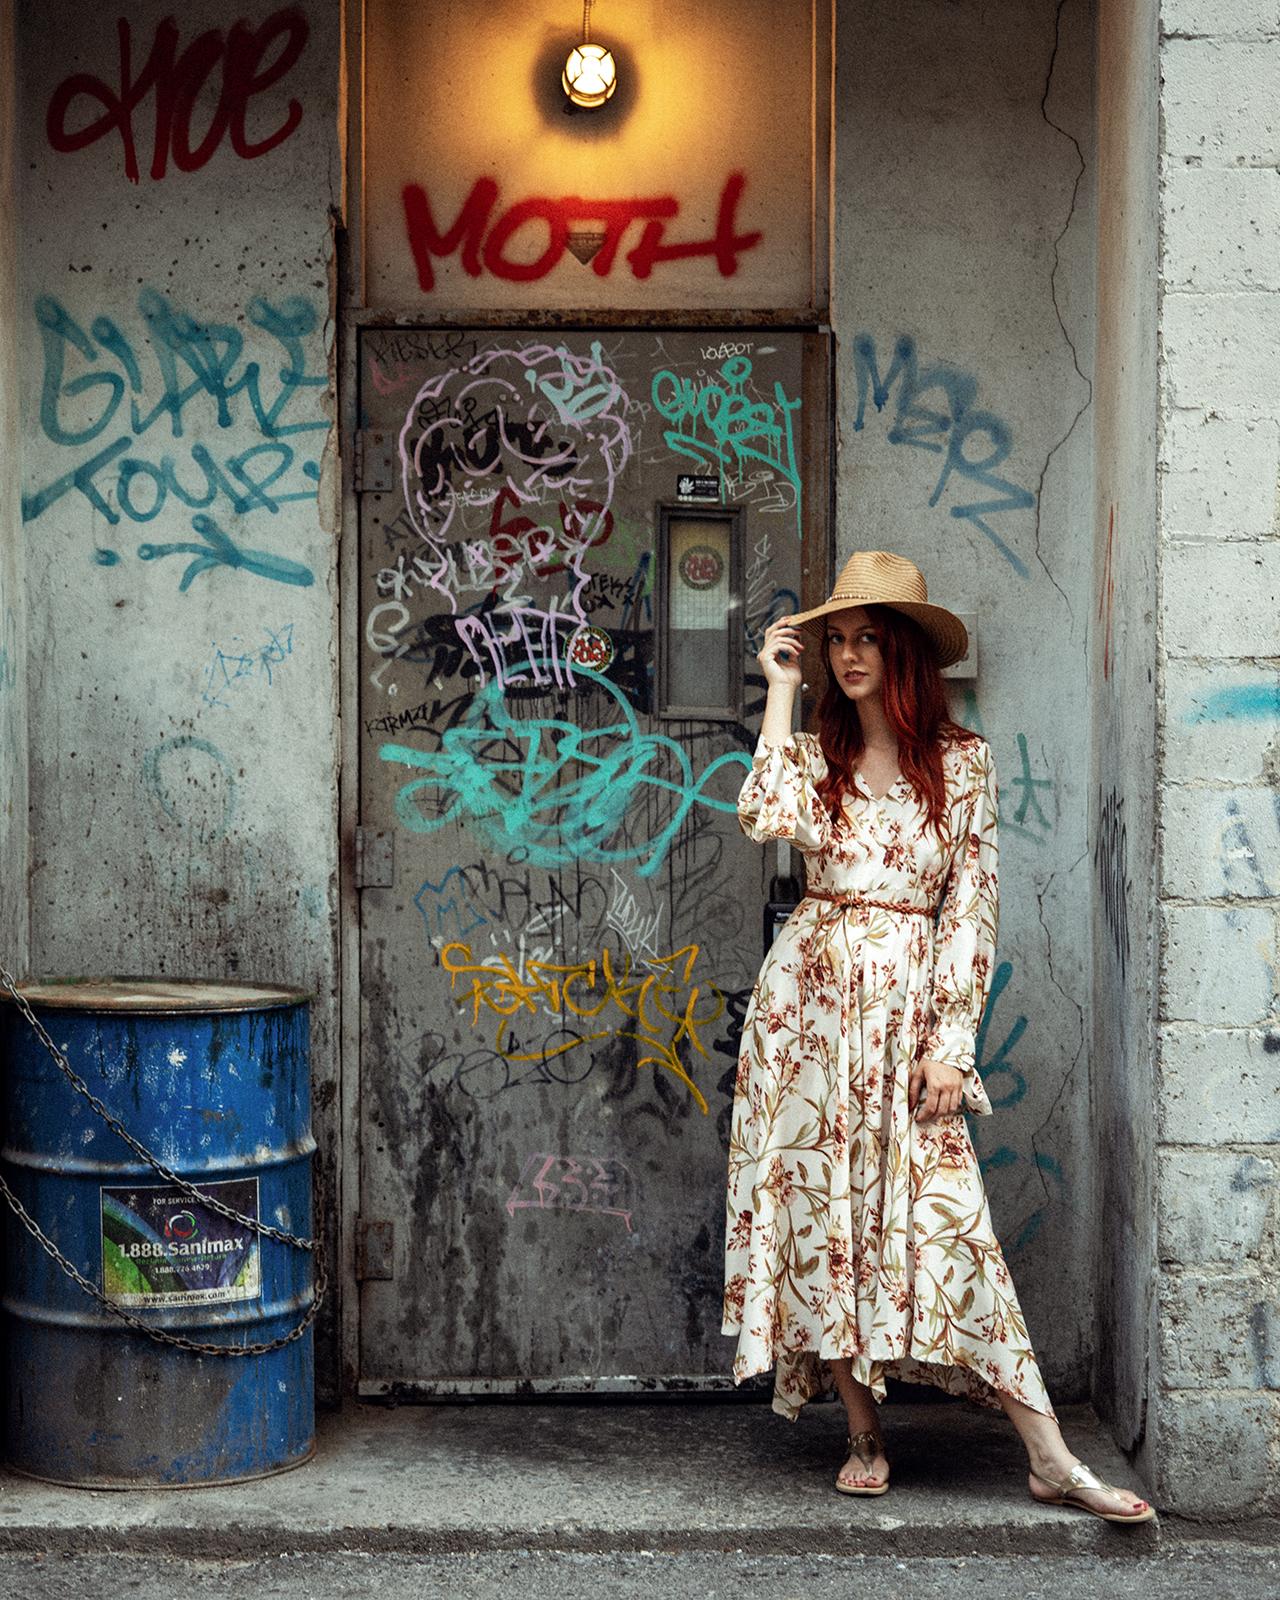 Photographer: Sergey Safronov